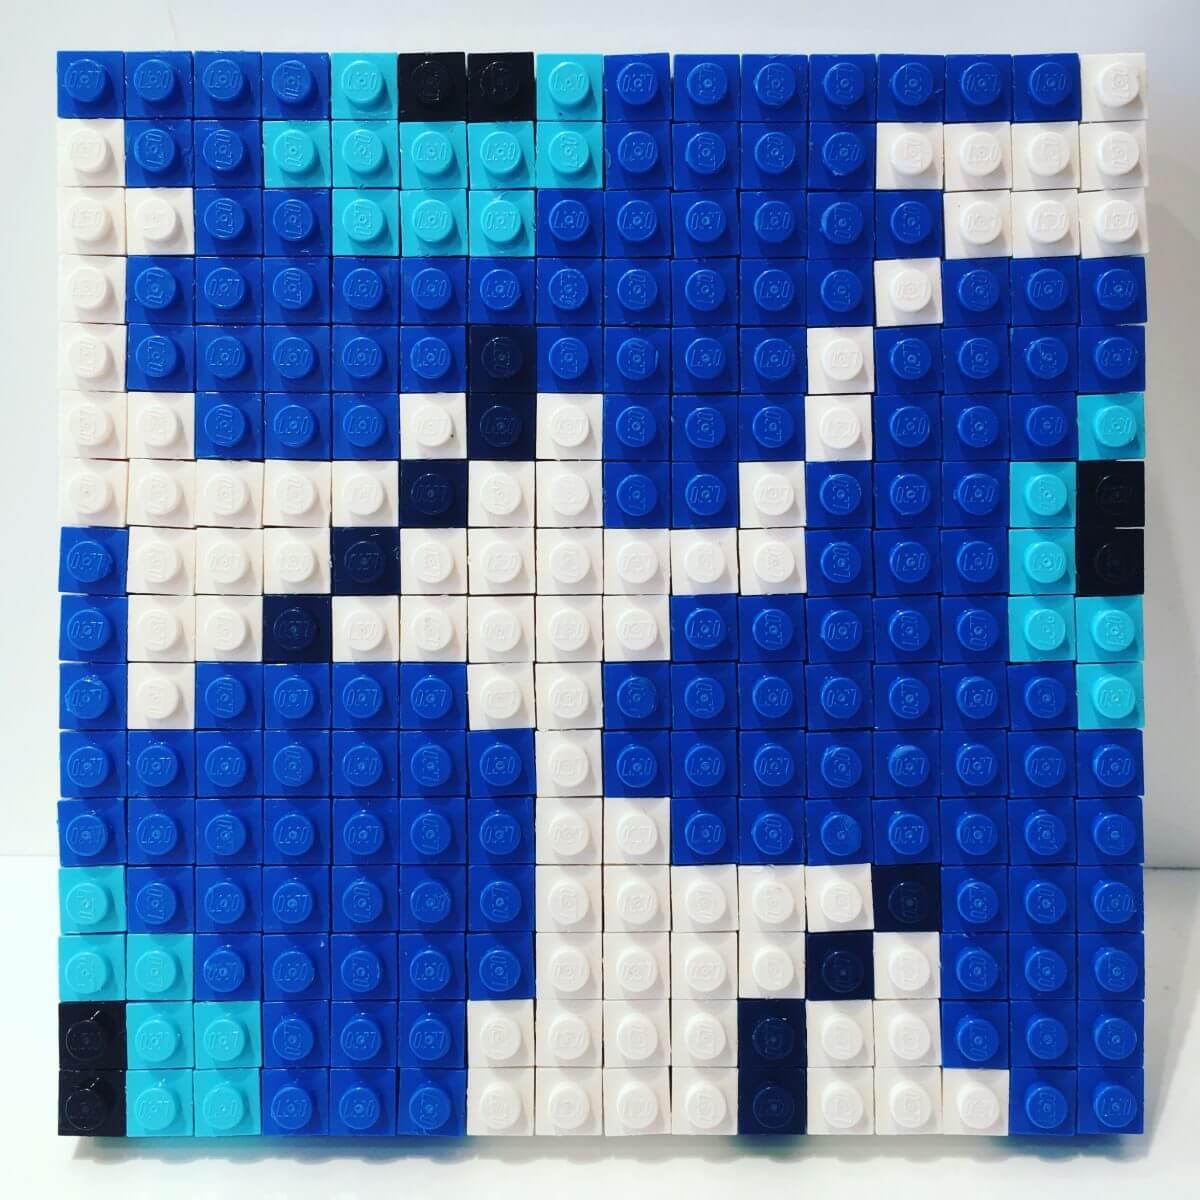 Mama's kunstwerk in LEGO House vlakbij Legoland Billund